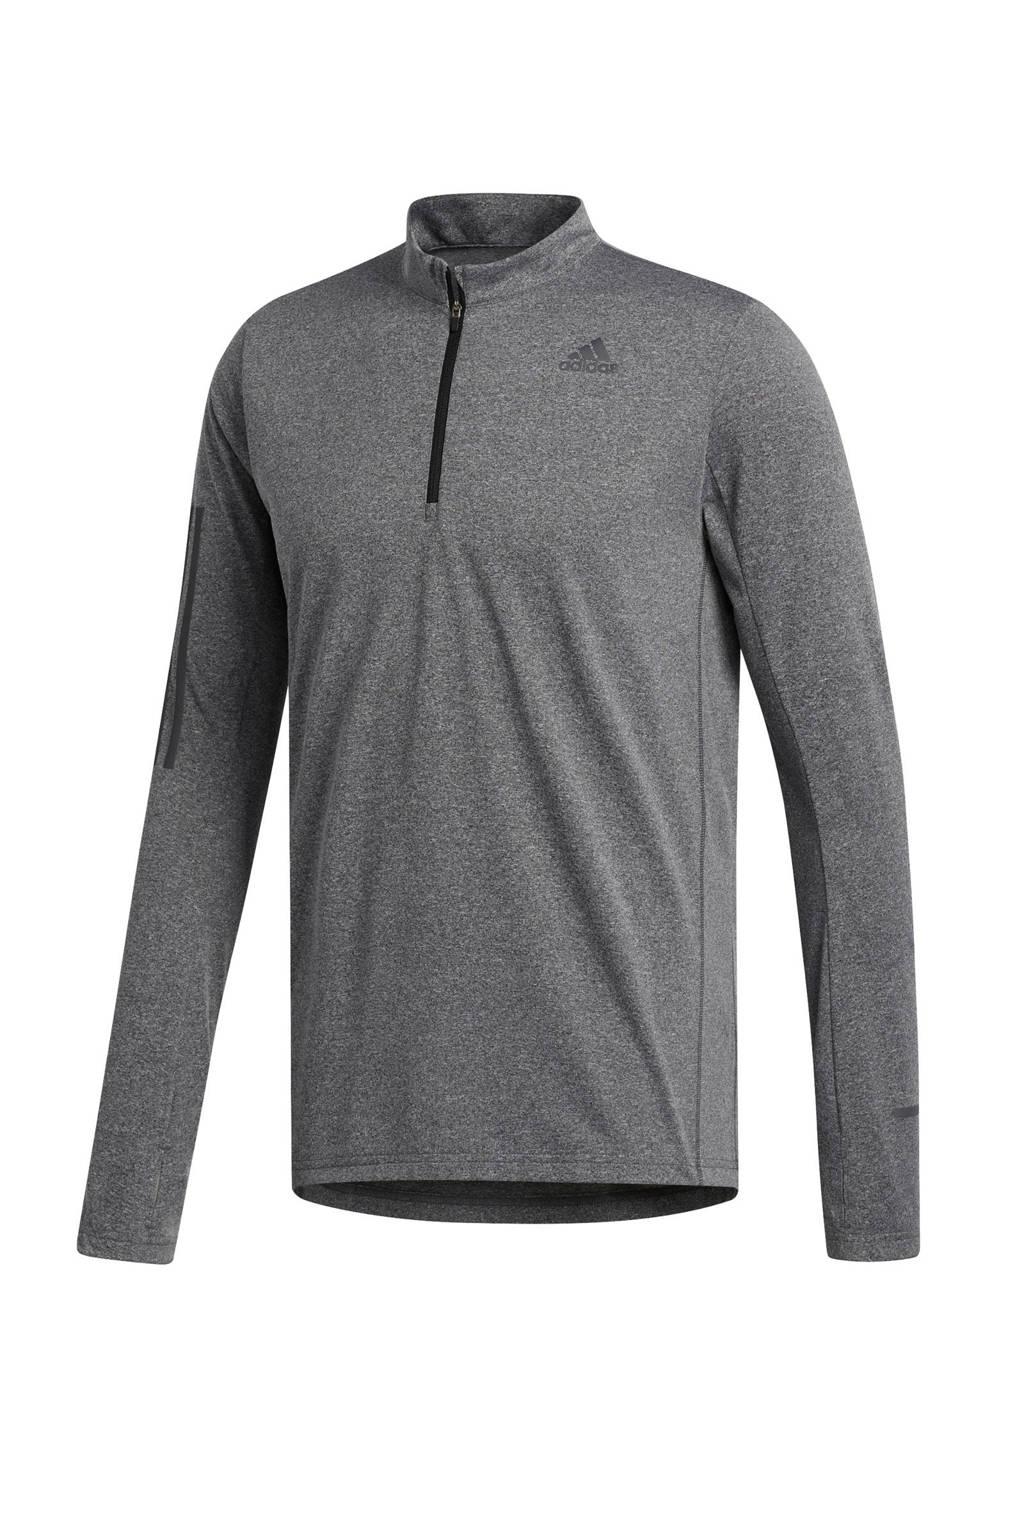 adidas Performance   hardloopshirt grijs, Grijs